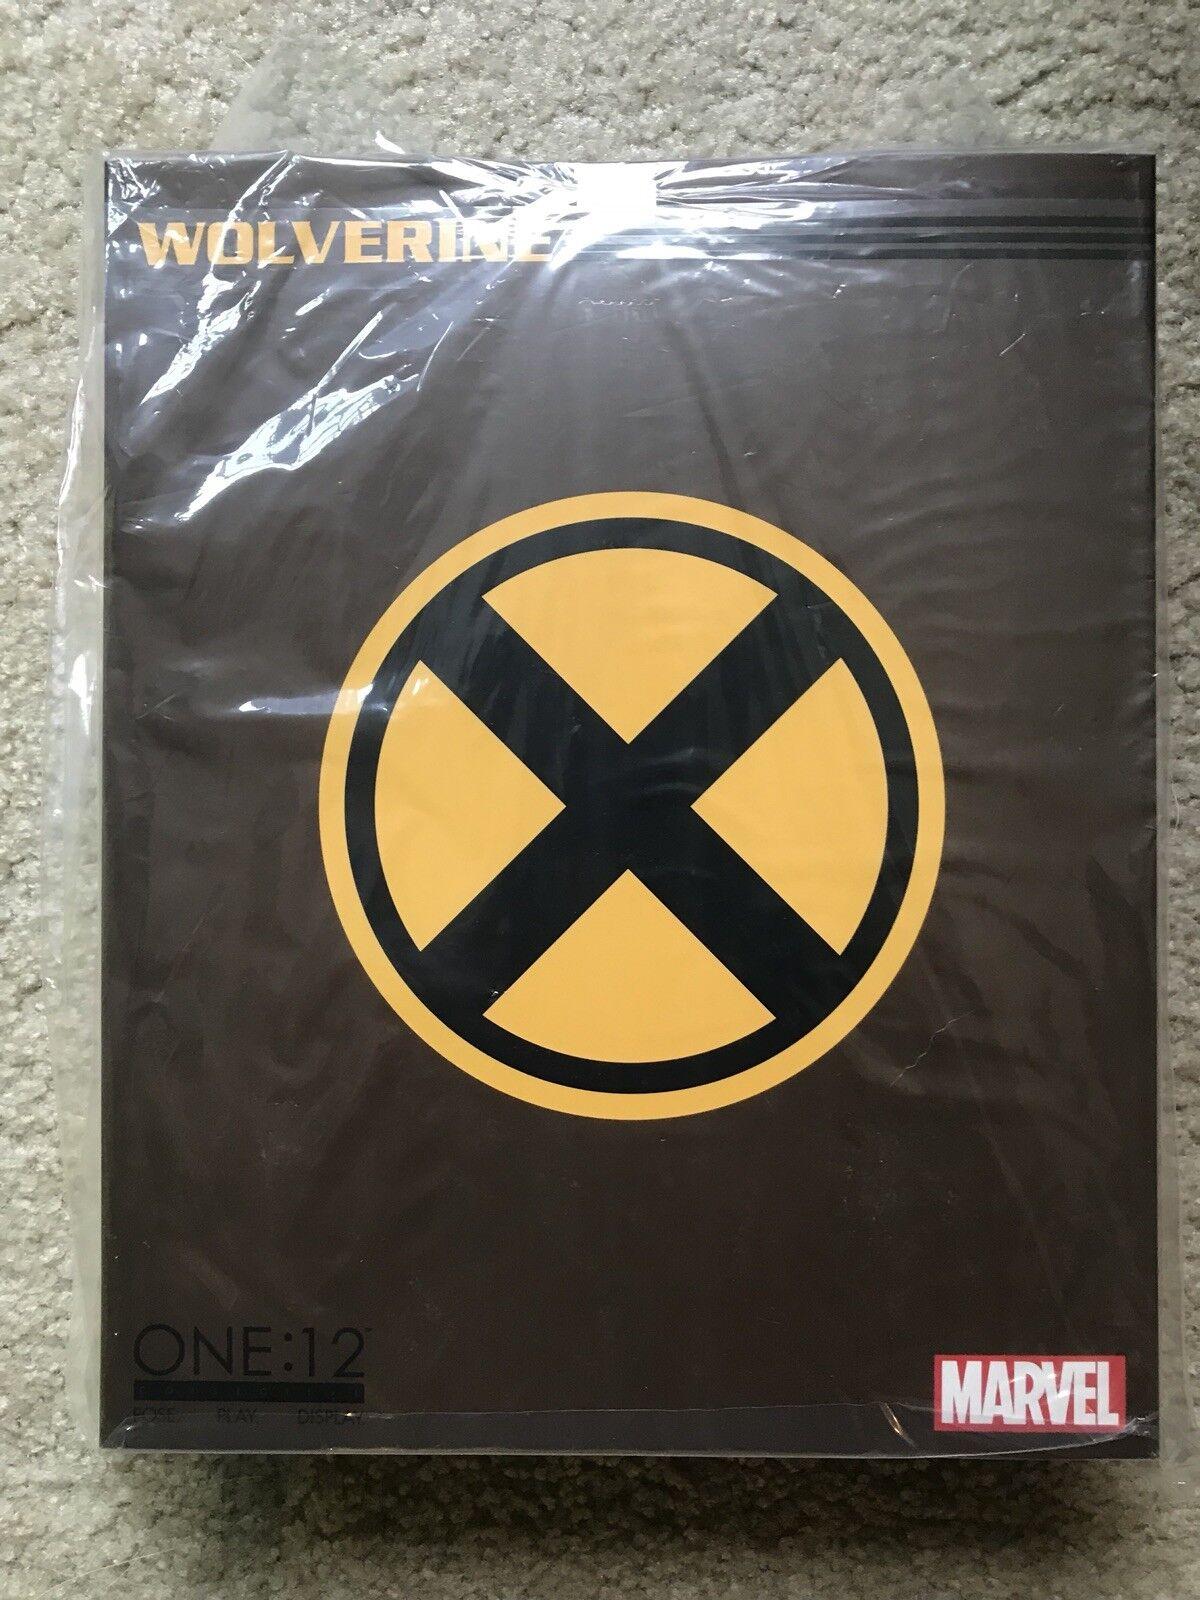 Mezco leksakz One 12 Collective Wolverine verkan Figur 6 tum NIB I HAND